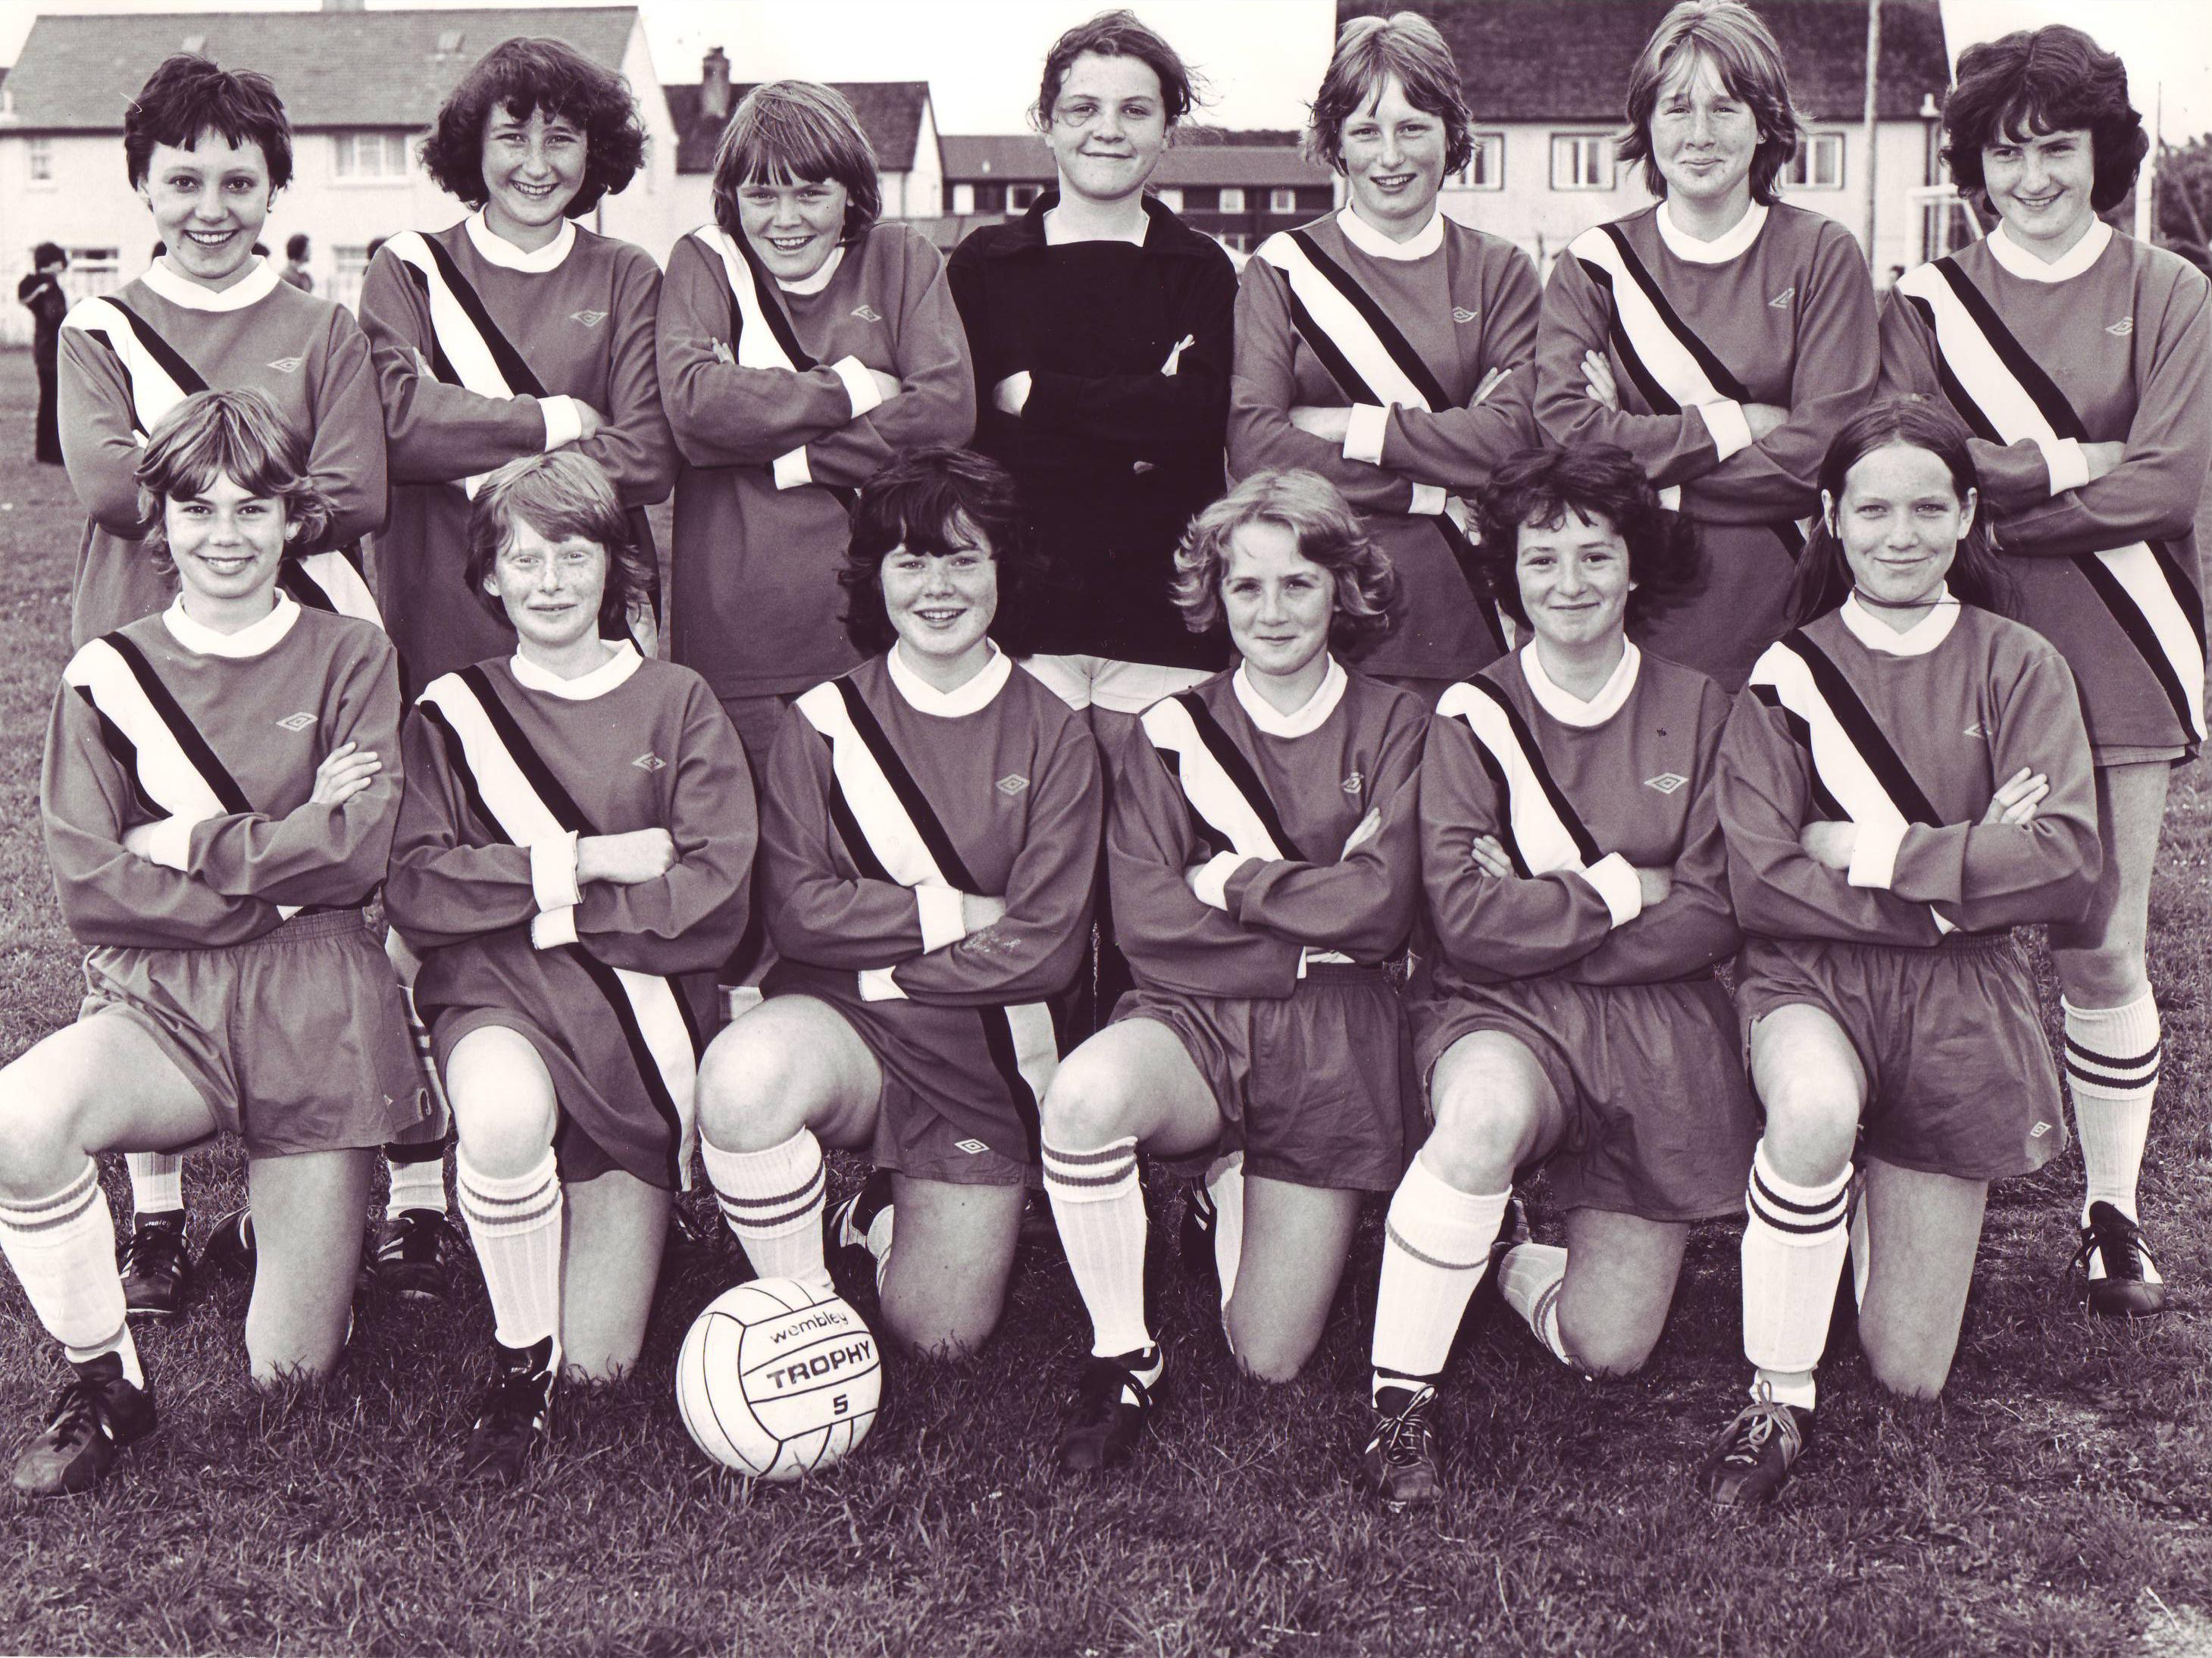 Balintore Ladies Football Team, early 1980's.